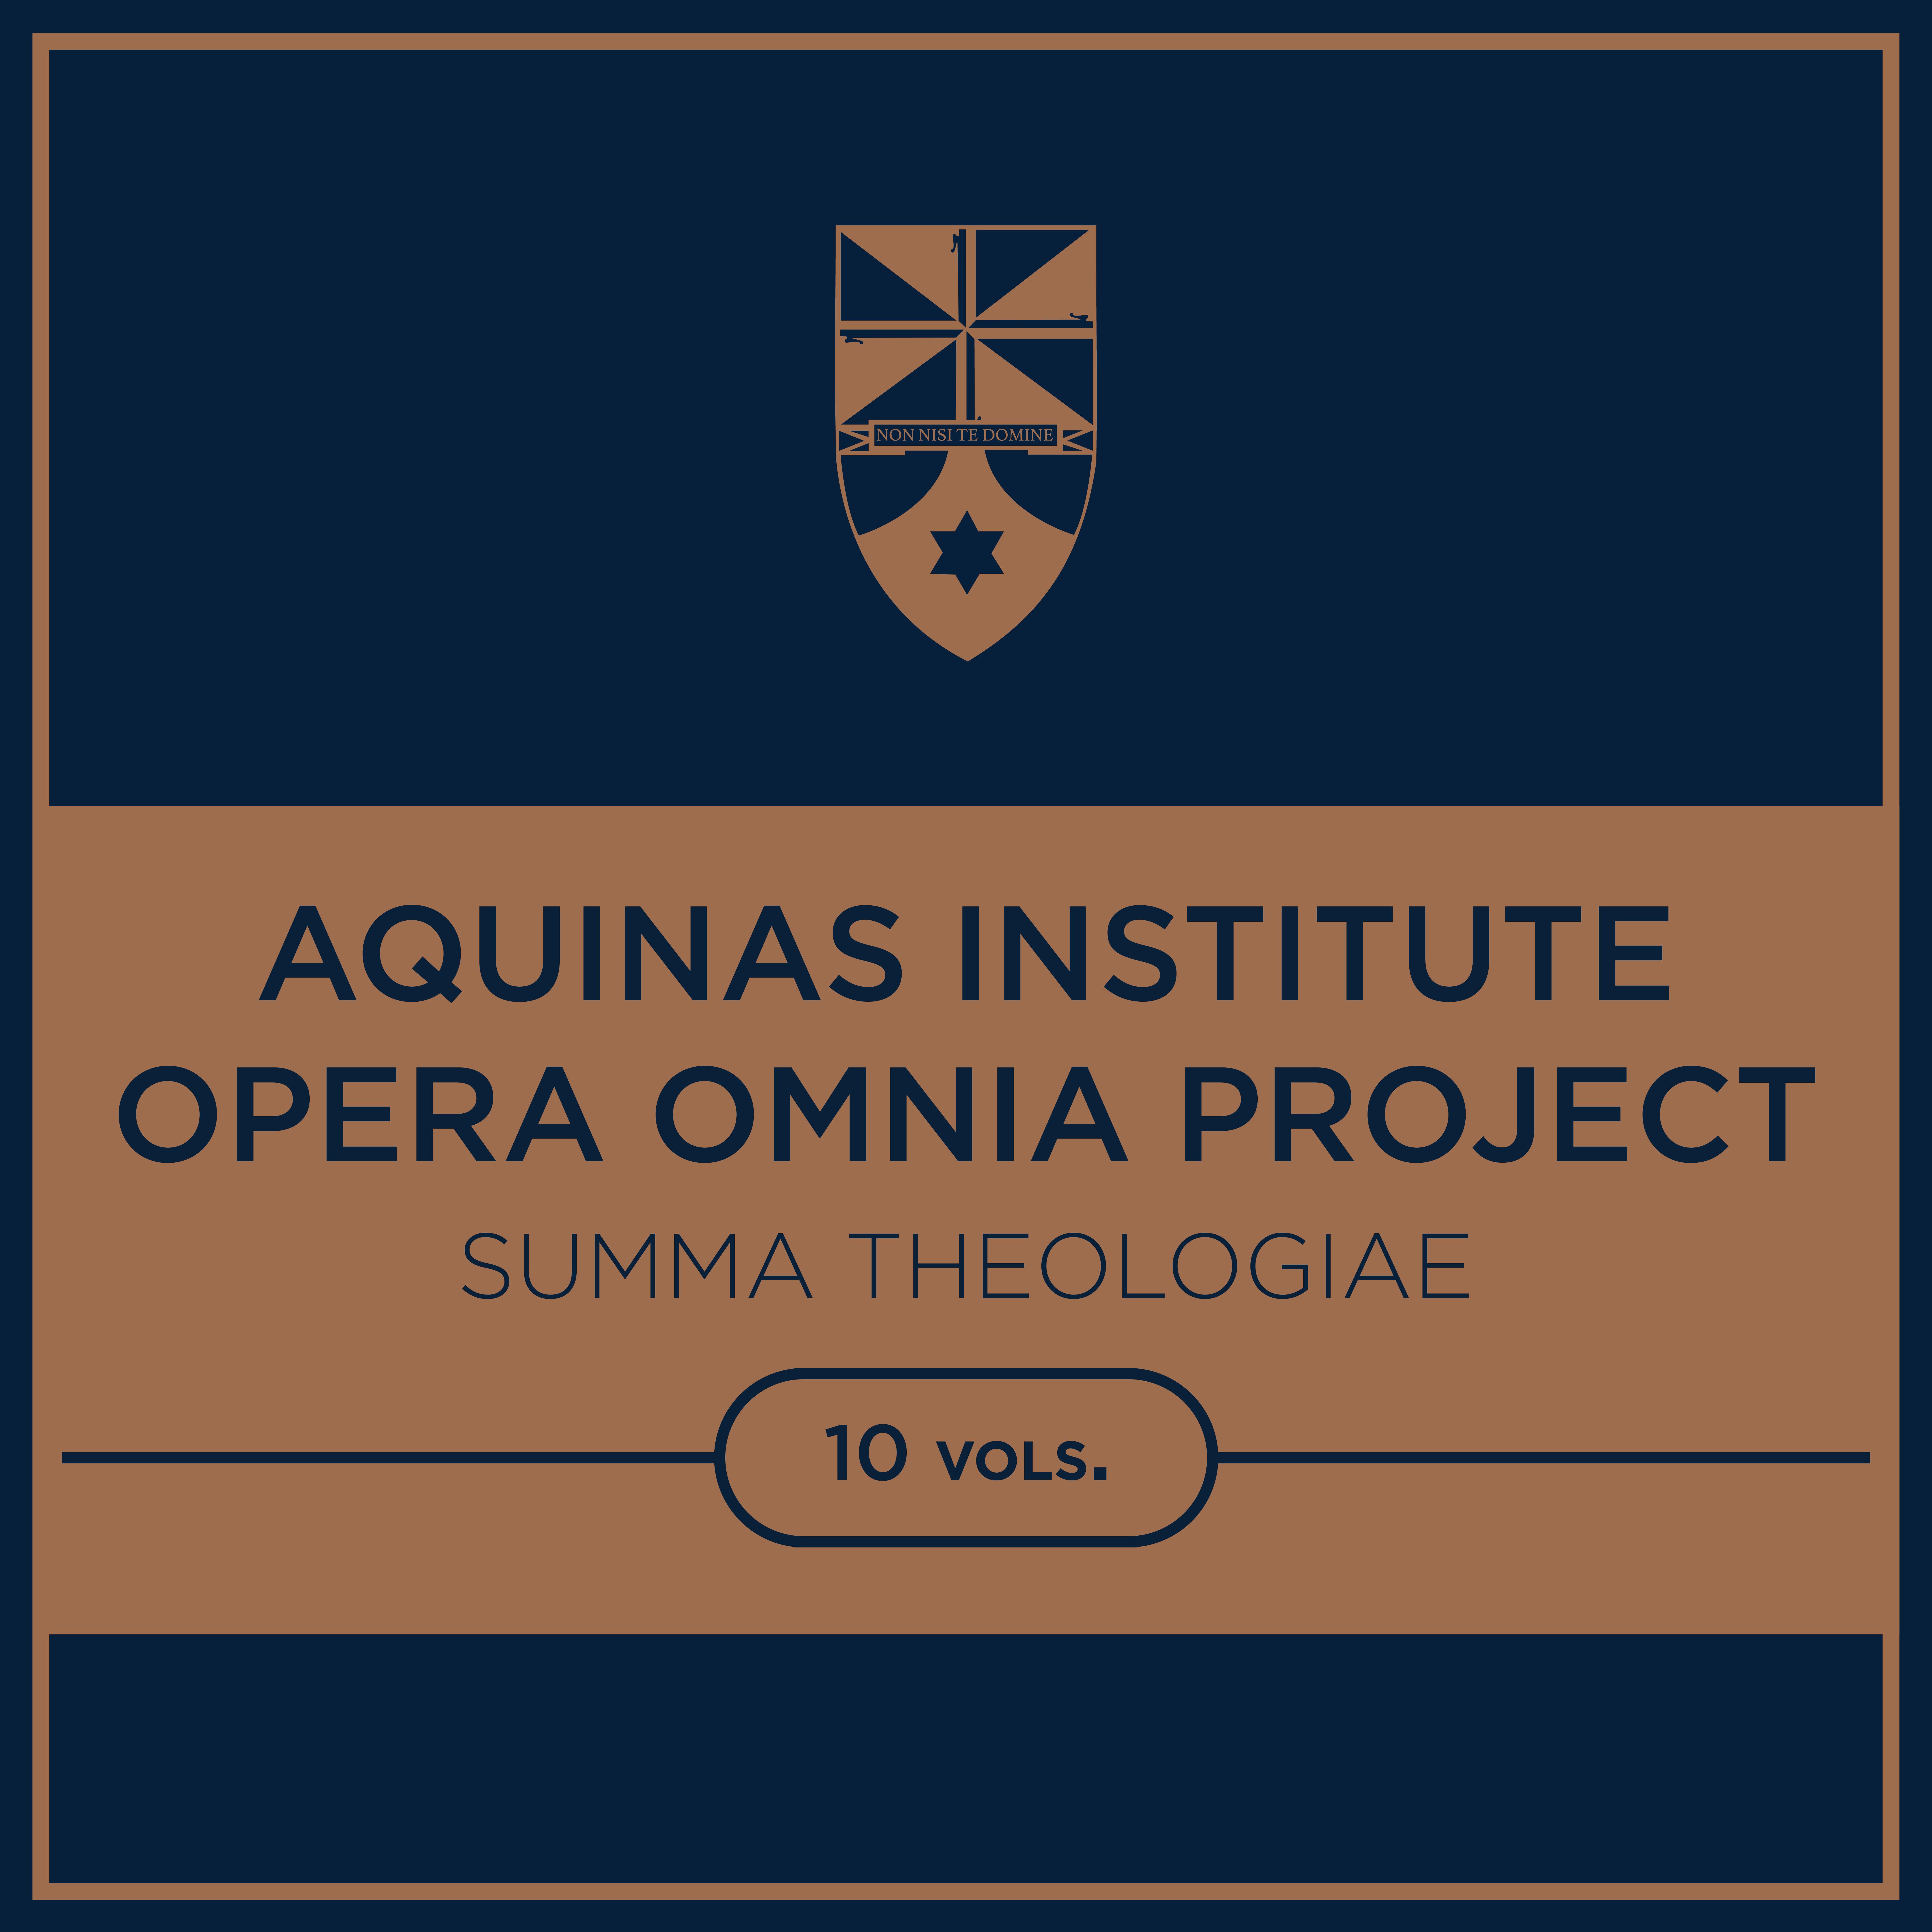 Aquinas Institute Opera Omnia Project: Summa Theologiae (10 vols.)